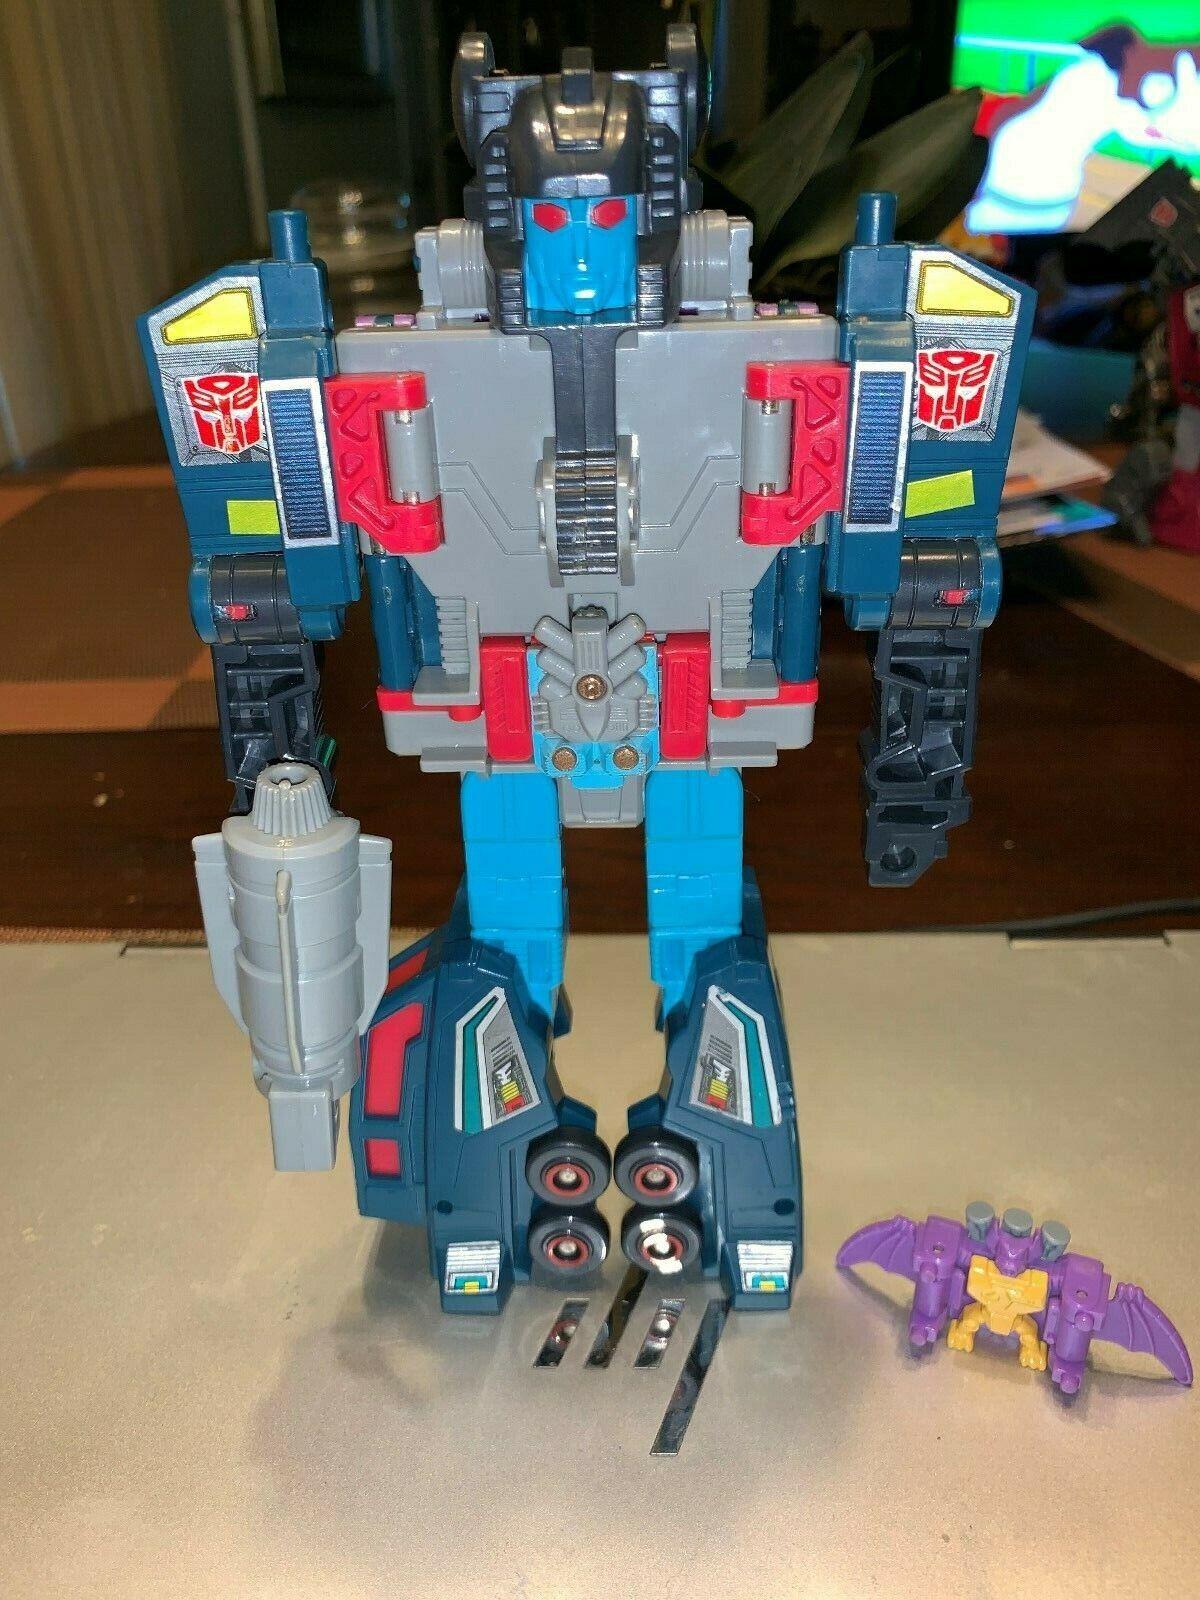 Doubledealer con Skar & Knok 1988 Transformers G1 Vintage Original impresionante LQQK